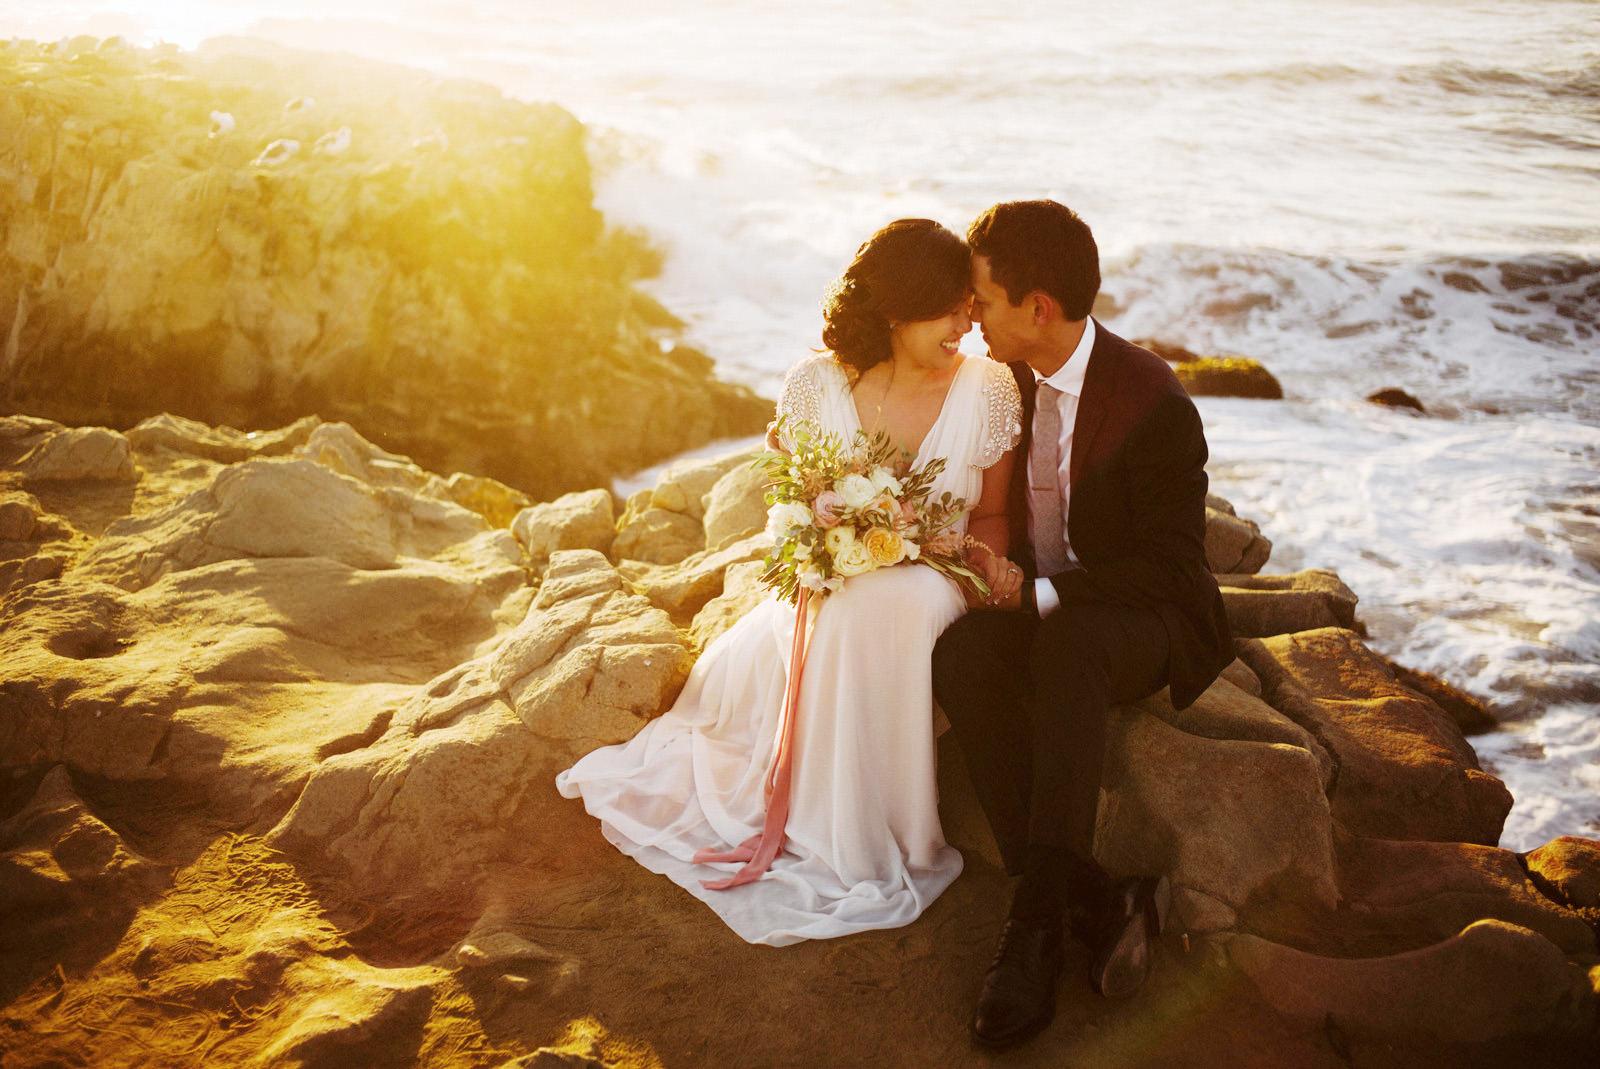 kimclay-blog-088 REDWOOD FOREST WEDDING